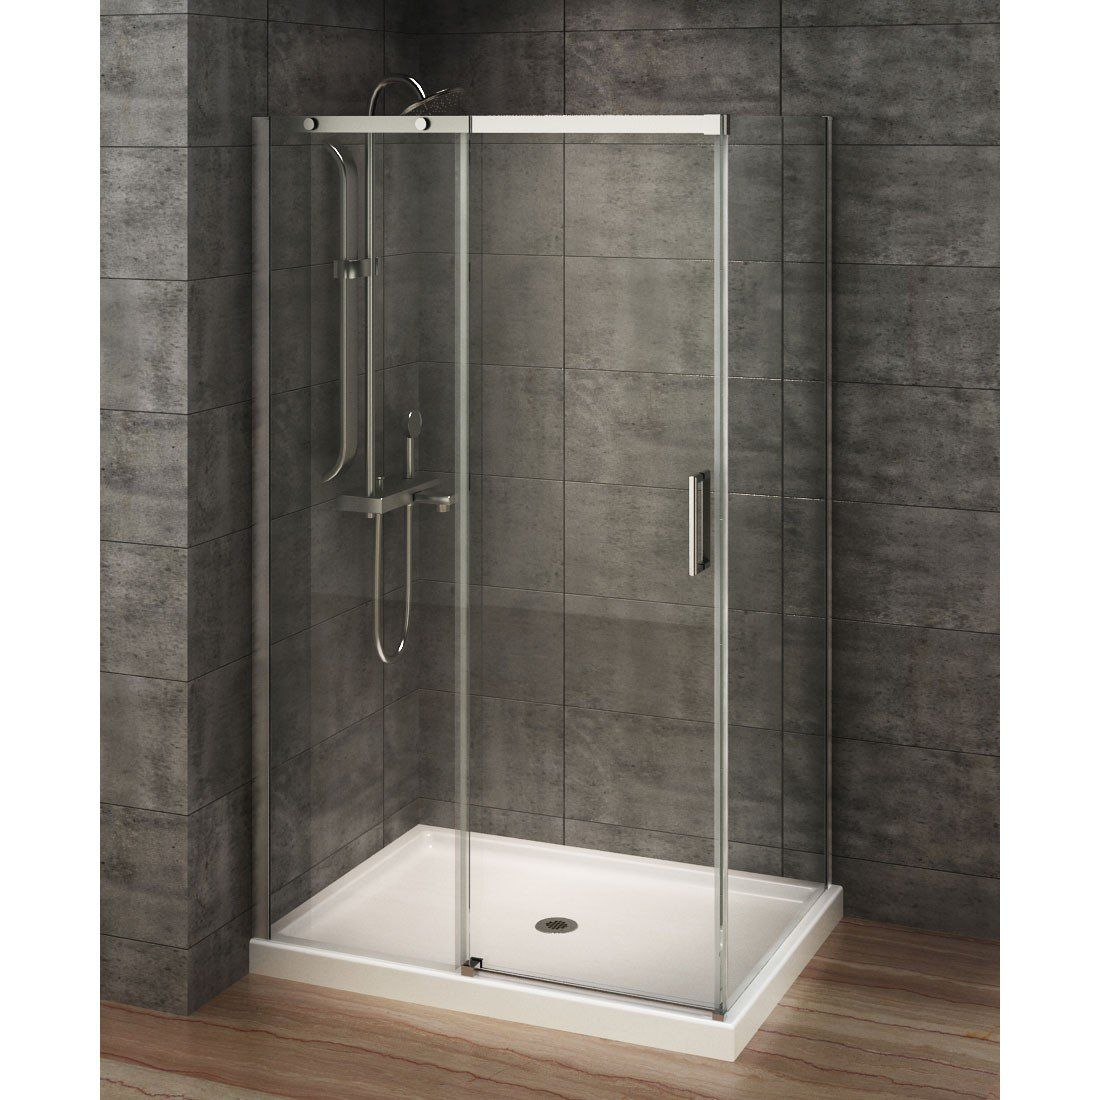 AampE Bath And Shower Berlin 48 X 32 Rectangular Corner